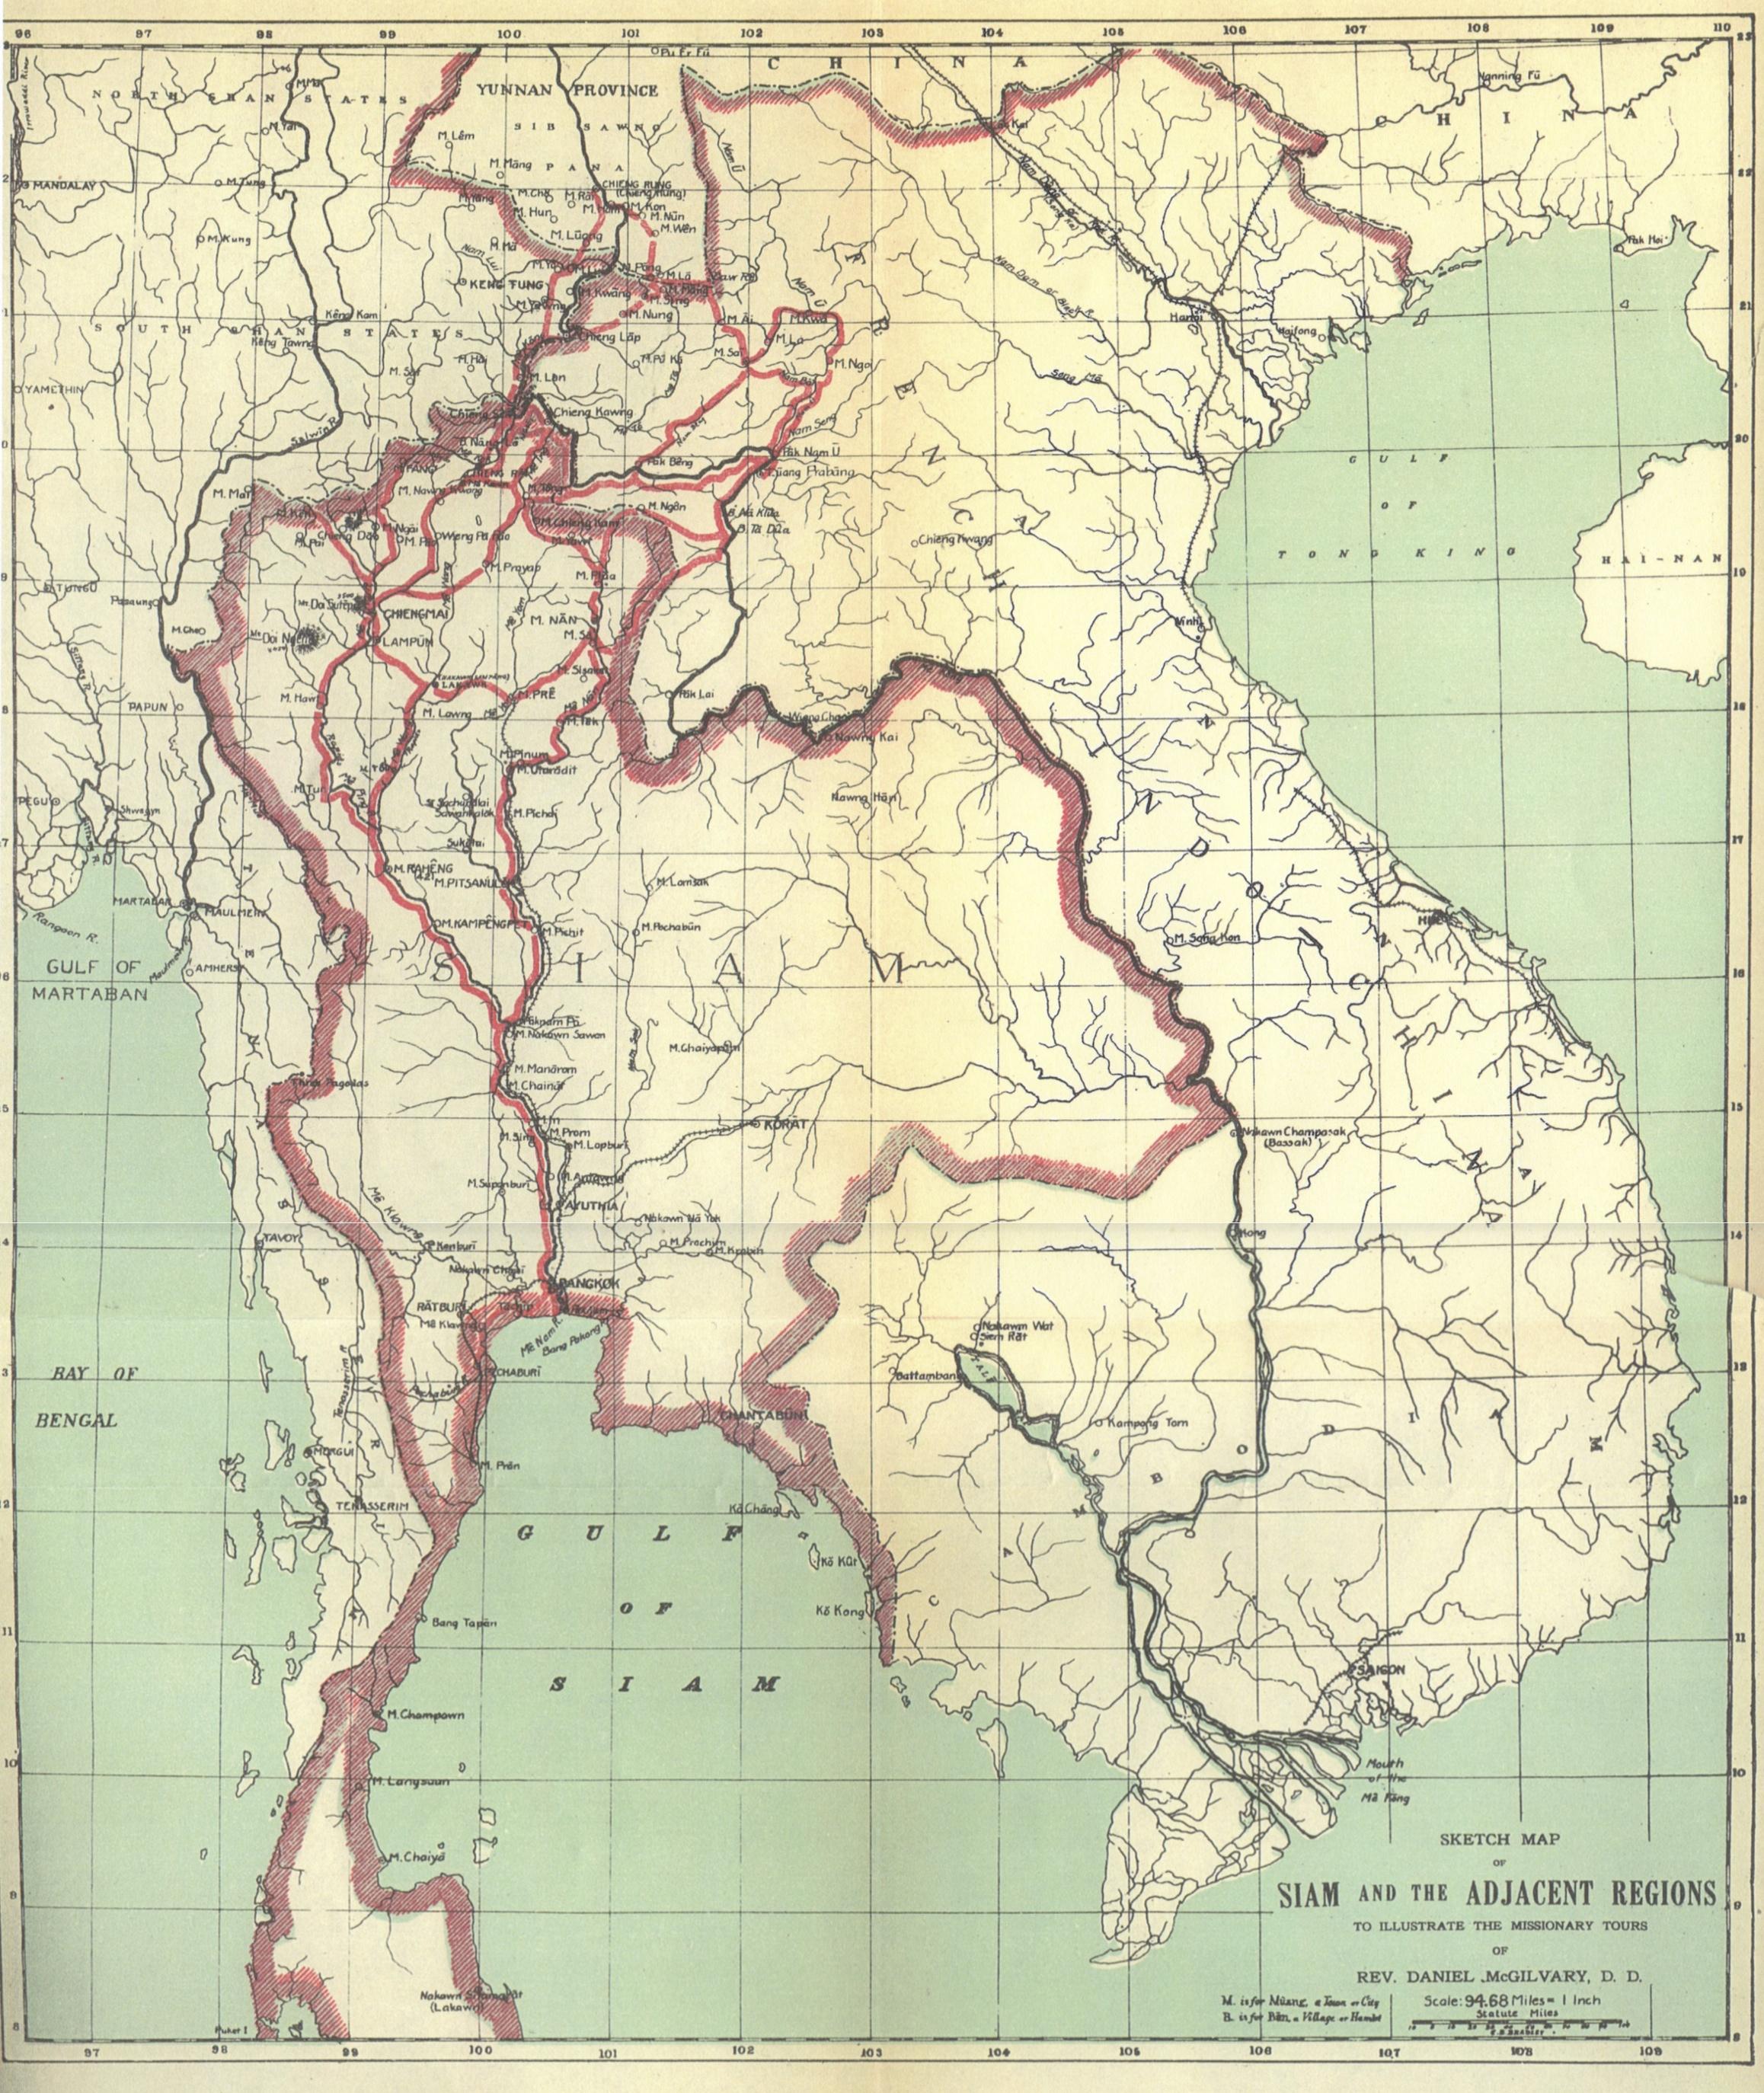 Tours Of Cambodia Vietnam And Thailand